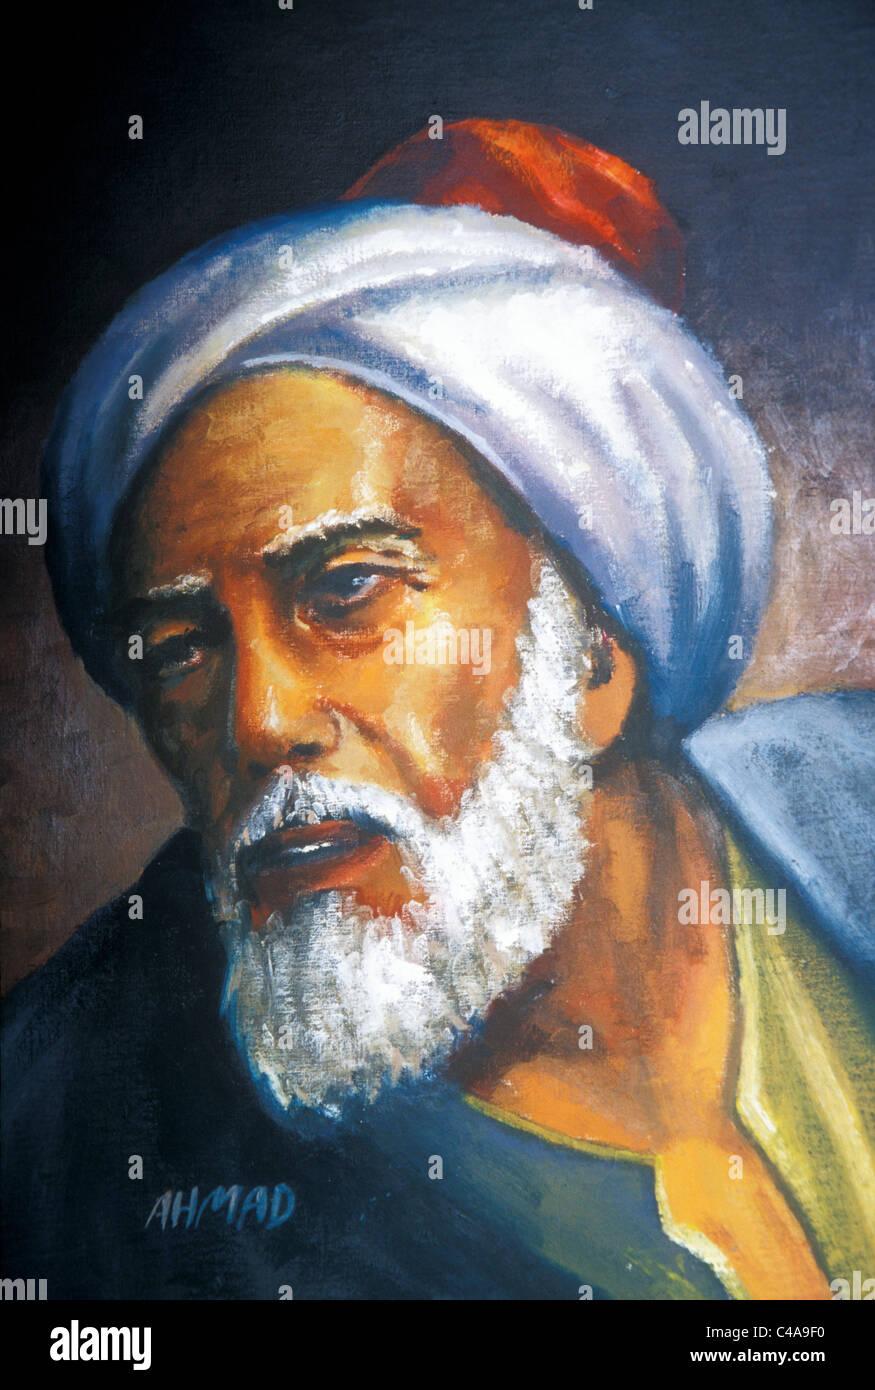 Abu Abd Allah M... Prophet Muhammad